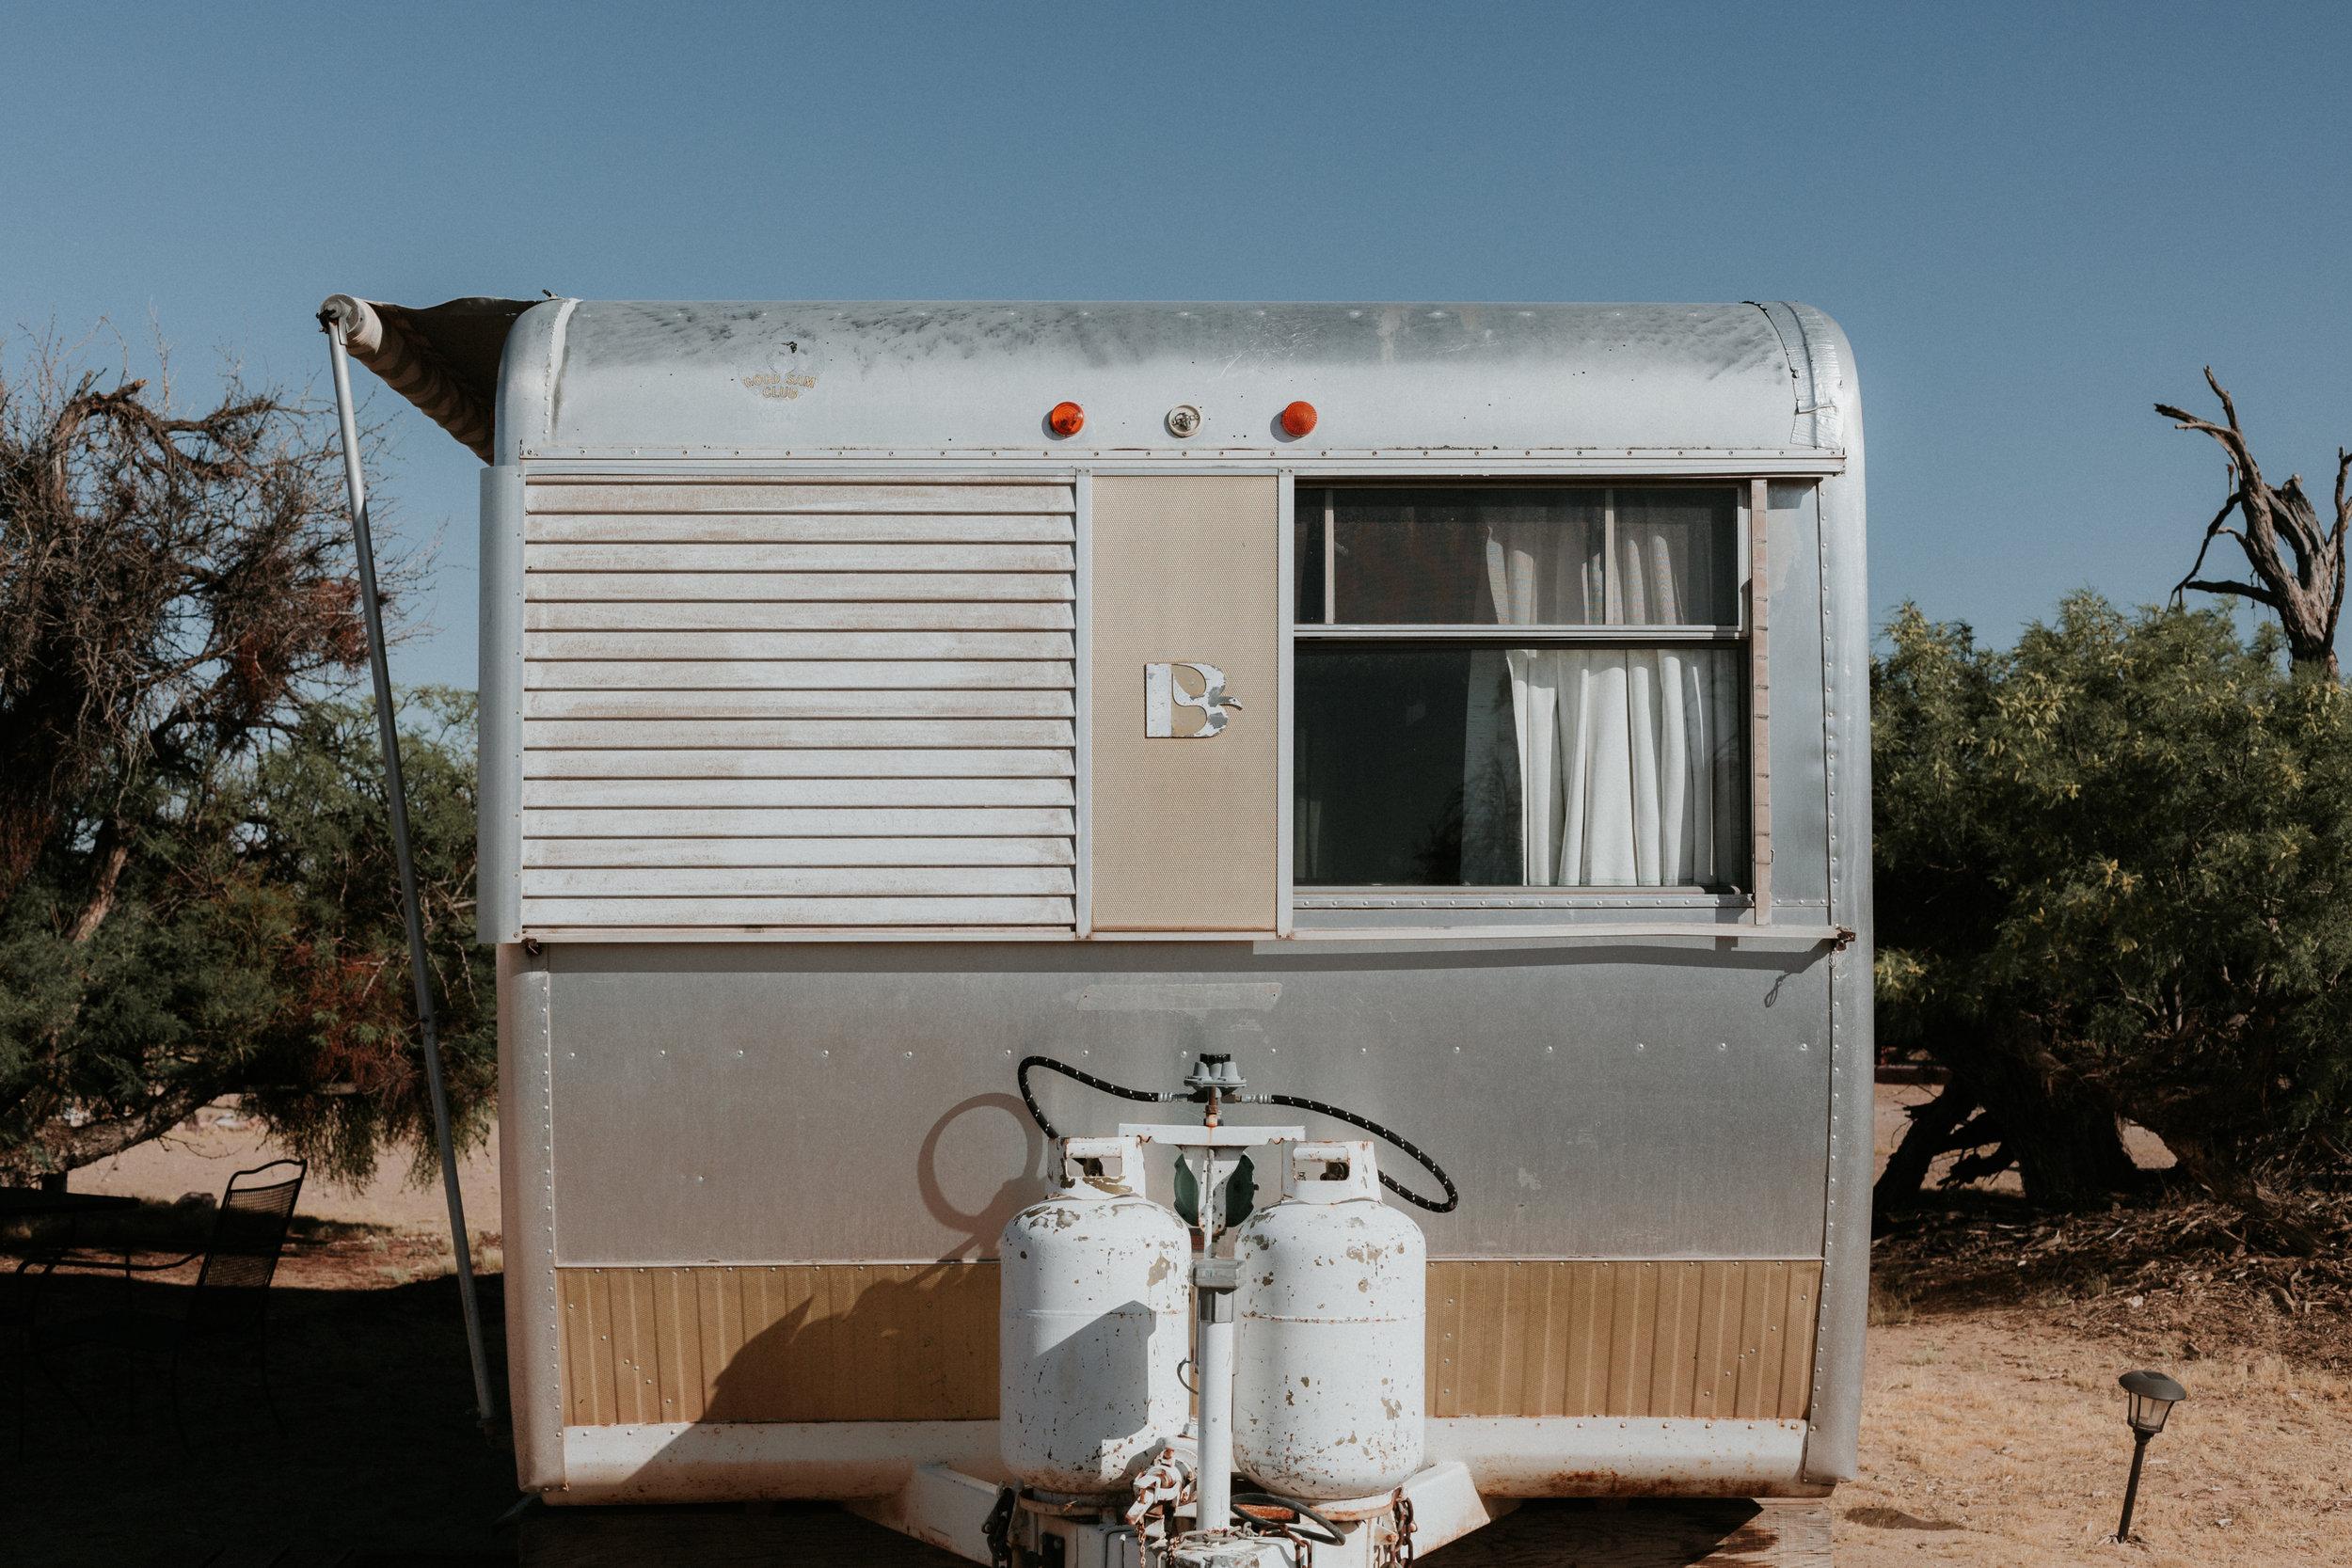 Las Vegas, Sandy Valley, Nevada desert Airbnb